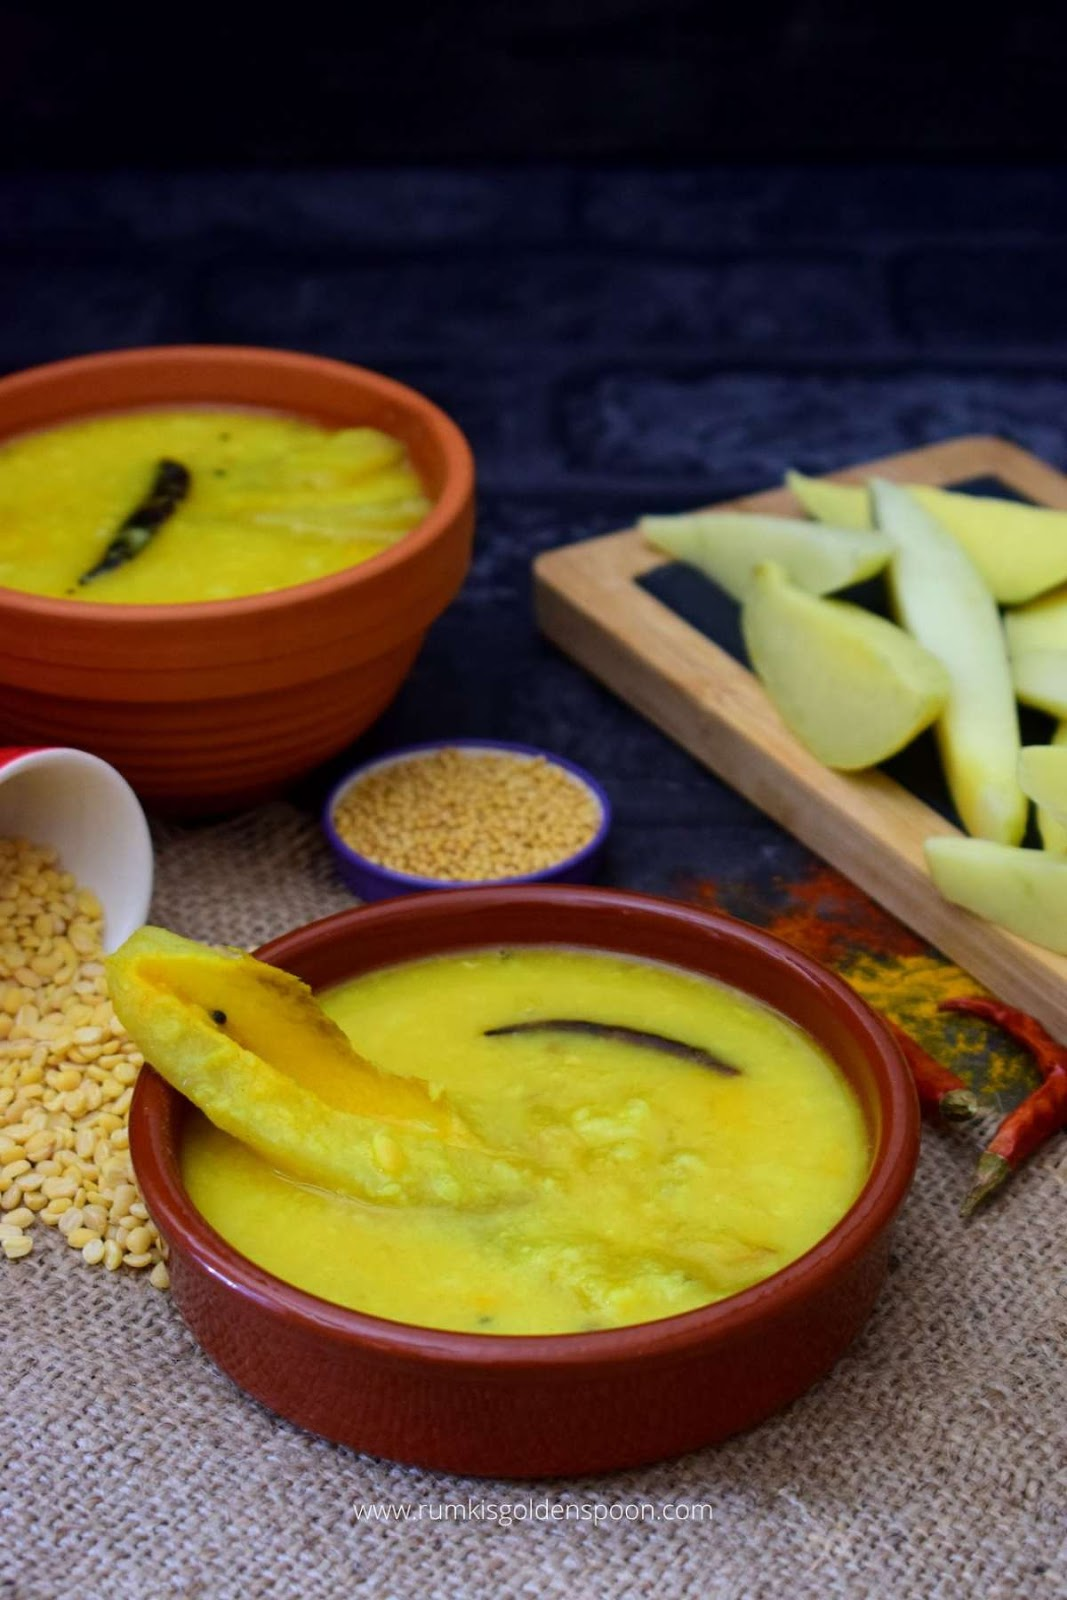 aam dal, aam dal recipe, aam dal Bengali recipe, kacha aam dal recipe, how to make aam dal,aam diye moong dal, tok dal, tok dal recipe, tok dal Bengali recipe, how to make tok dal, aamer tok dal, kacha aam diye tok dal, tok dal kacha aam diye, Bengali tok dal, Bengali aam dal, mango dal, mango dal recipe, how to make mango dal, mango dal Bengali recipe, dal with mango recipe, green mango dal recipe, raw mango dal, raw mango dal recipe, dal with raw mango recipe, dal with raw mango, dal recipe, dal recipes, recipe for dal, bengali recipe, bengali recipes, bengali food, vegetarian recipes of india, vegetarian recipes in India, bengali food recipes, recipes of bengali food, homemade bengali food, traditional bengali food, bengali recipes veg, bengali traditional food, traditional food of Bengali, bengali veg recipe, bengali veg recipes, bengali vegetable recipe, bengali vegetarian recipe, lentil soup, mango lenitil soup, recipe for moong dal, Bengali style aam dal, Rumki's Golden Spoon